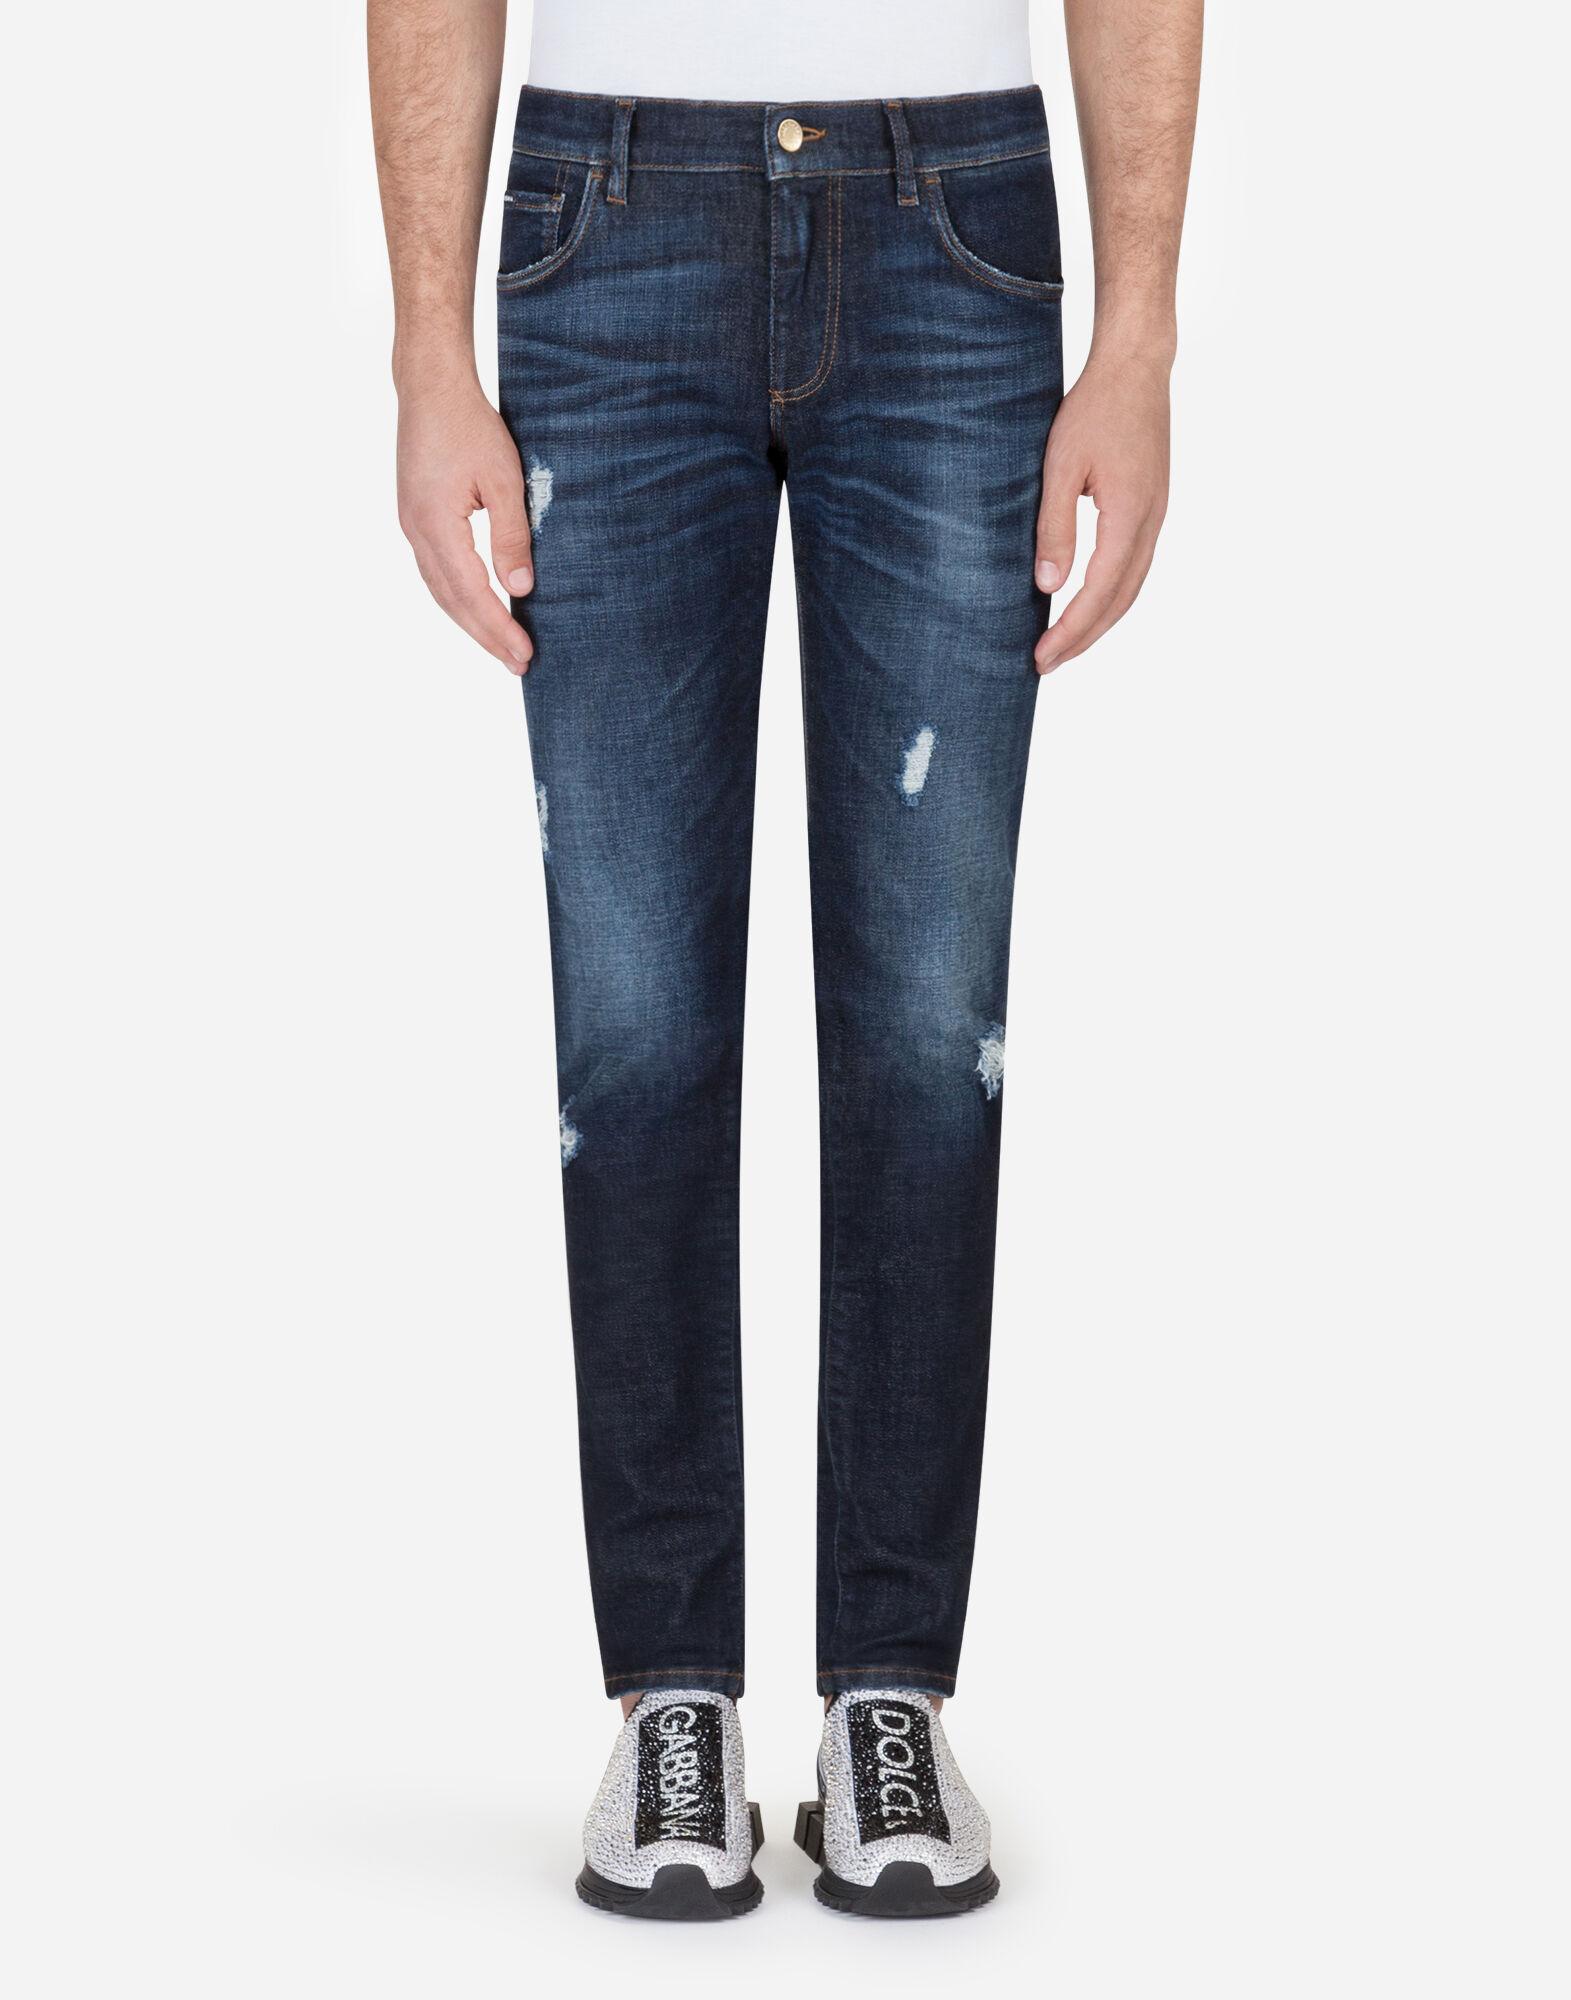 HommeDolce Jeans amp;gabbana amp;gabbana Jeans amp;gabbana HommeDolce Jeans HommeDolce XPkZui